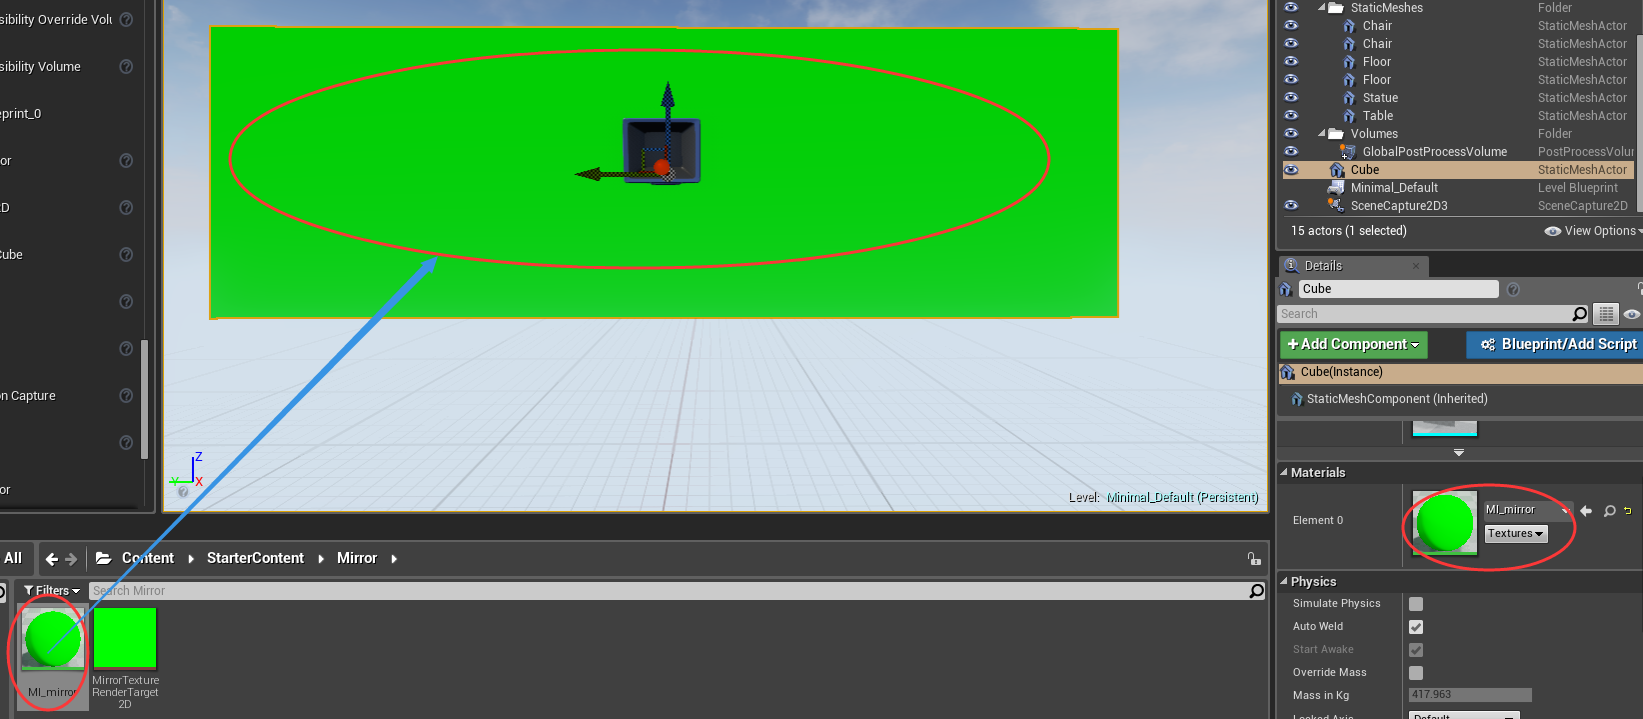 UE4蓝图案例:制作实时反射镜面材质 UE4教程 第10张